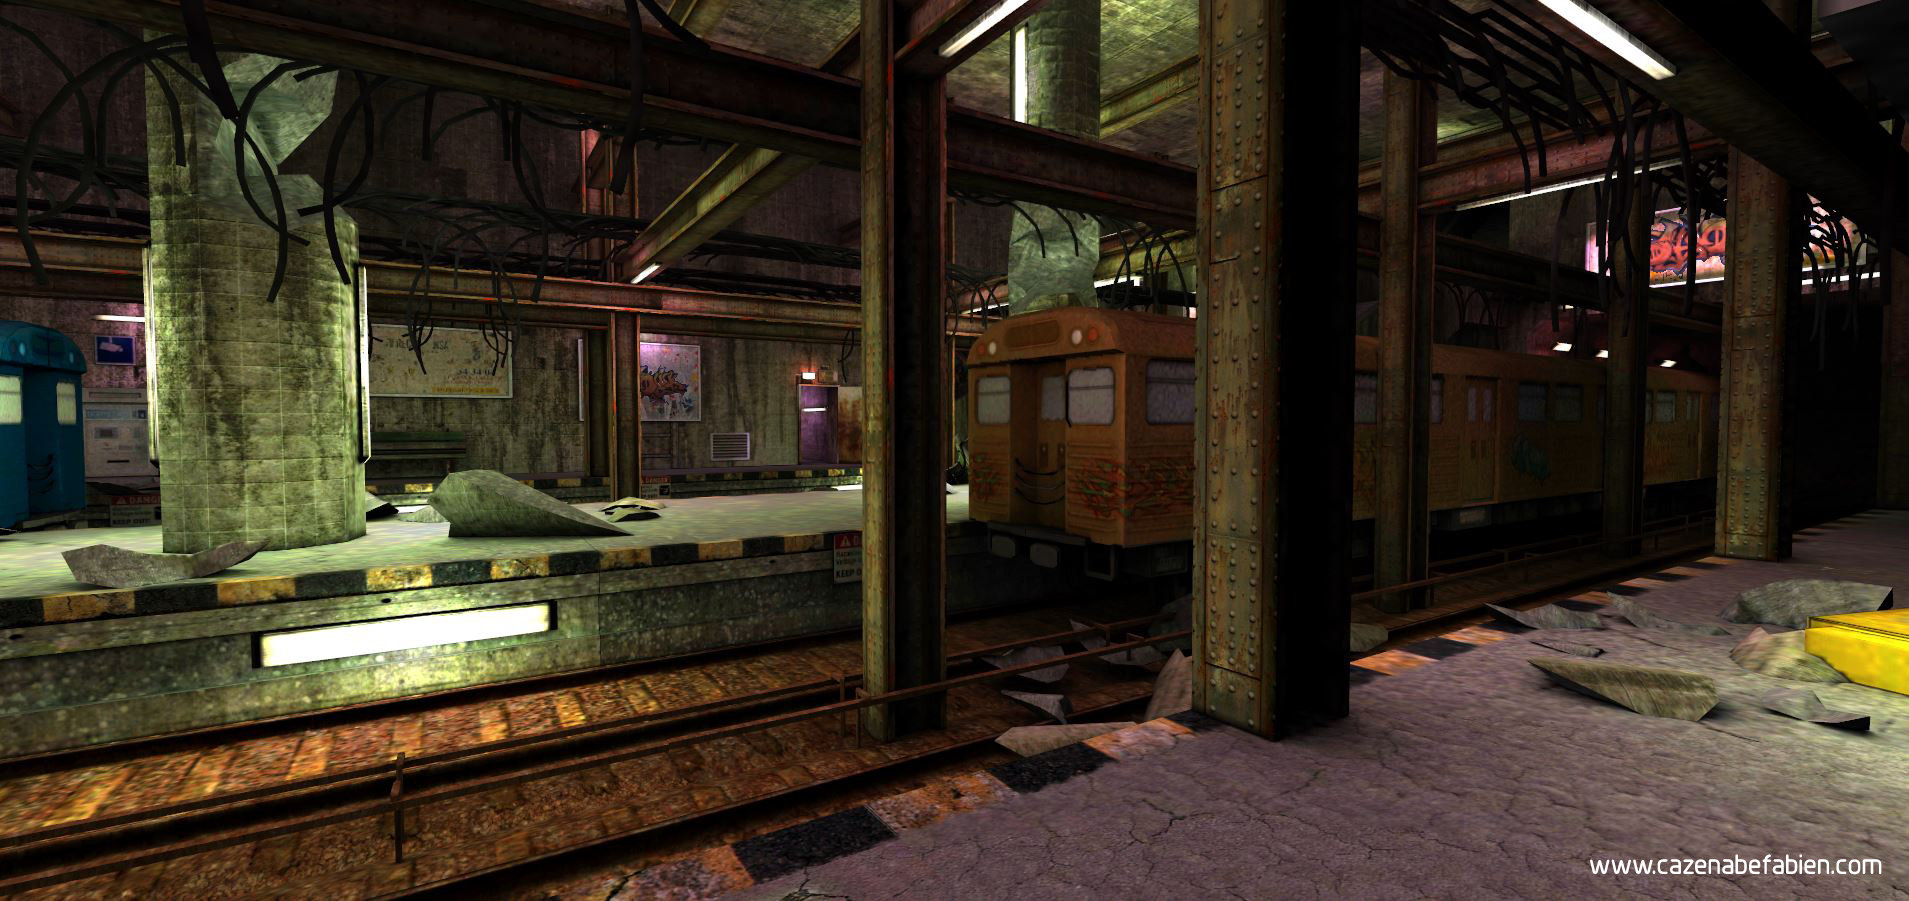 Fabien cazenabe subway cam1 06